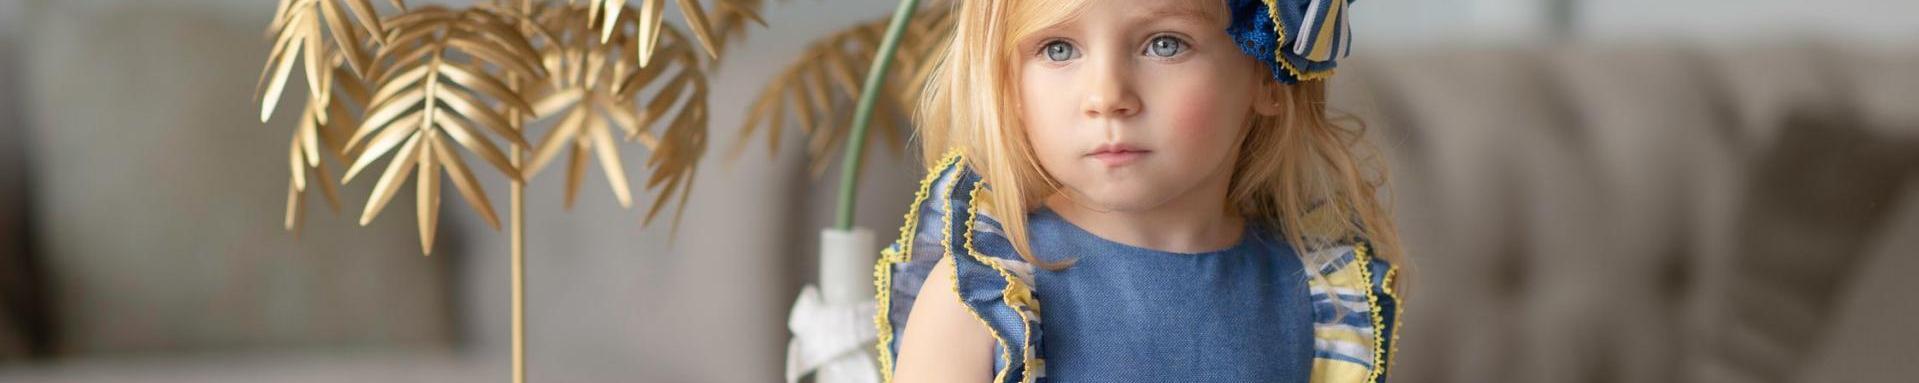 Moda infantil en tu Web de confianza